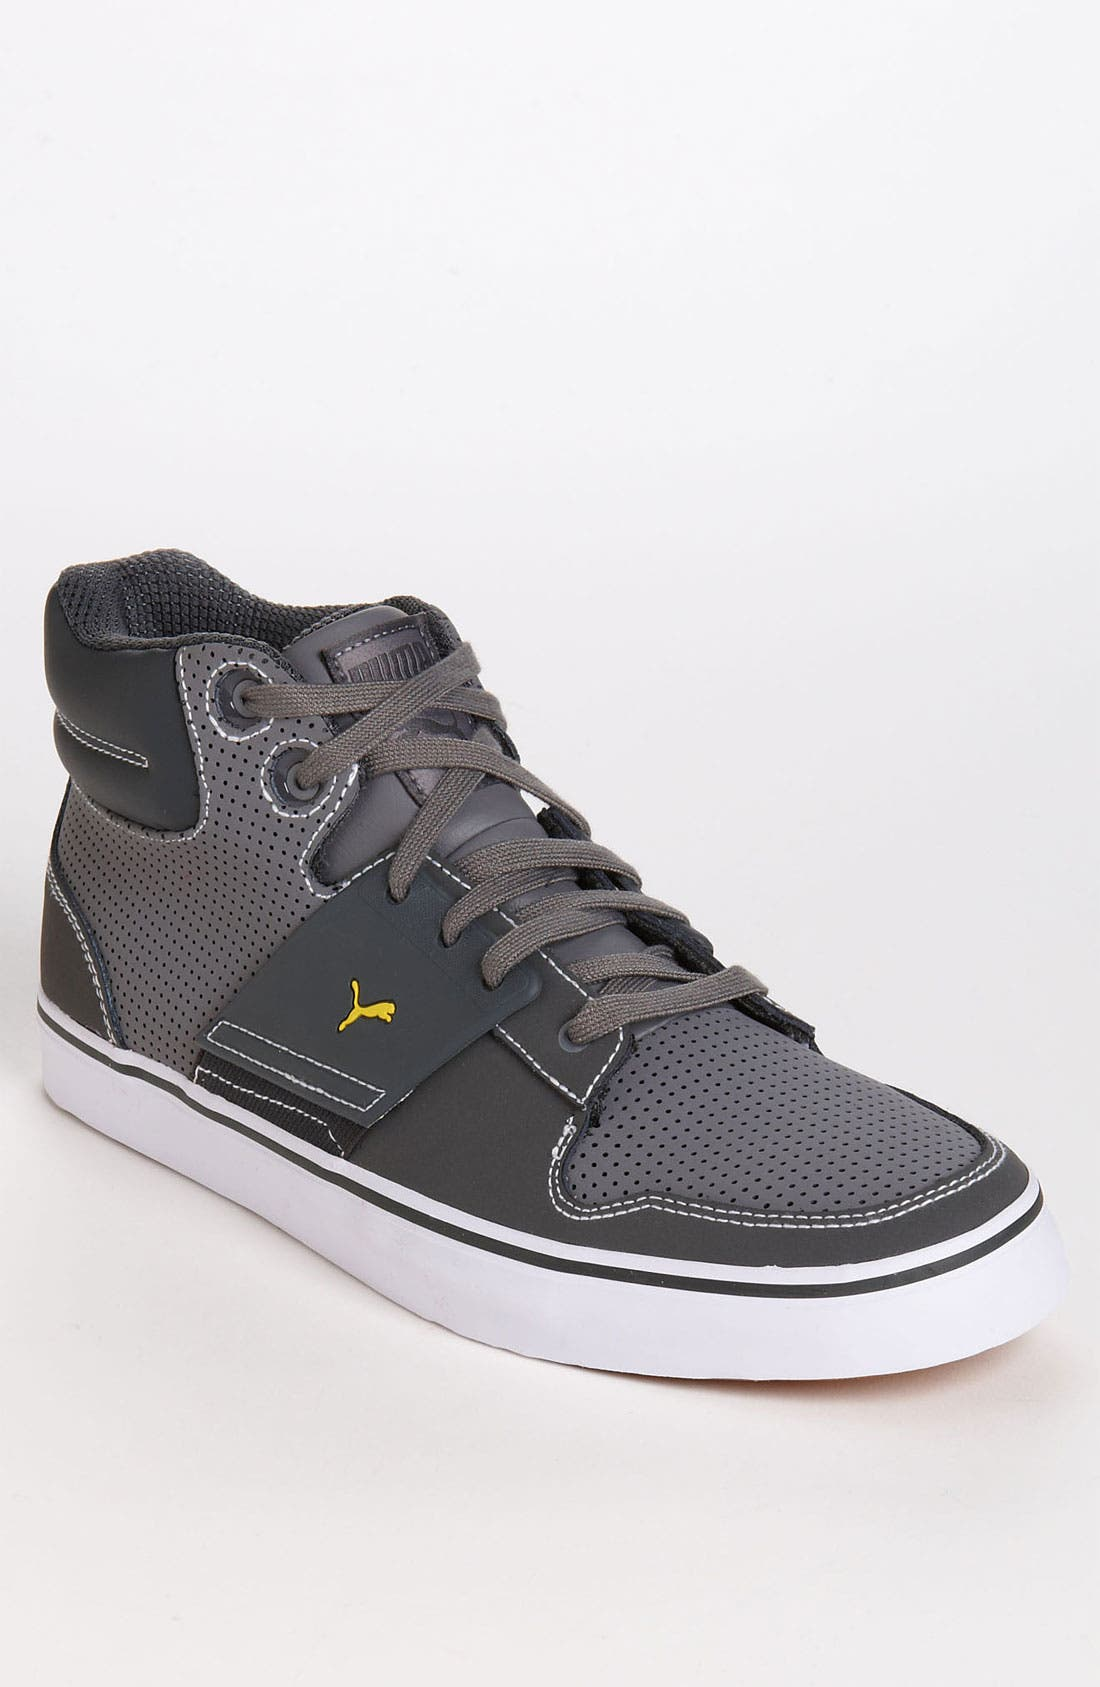 Alternate Image 1 Selected - PUMA 'El Ace 2 Mid' Sneaker (Men)